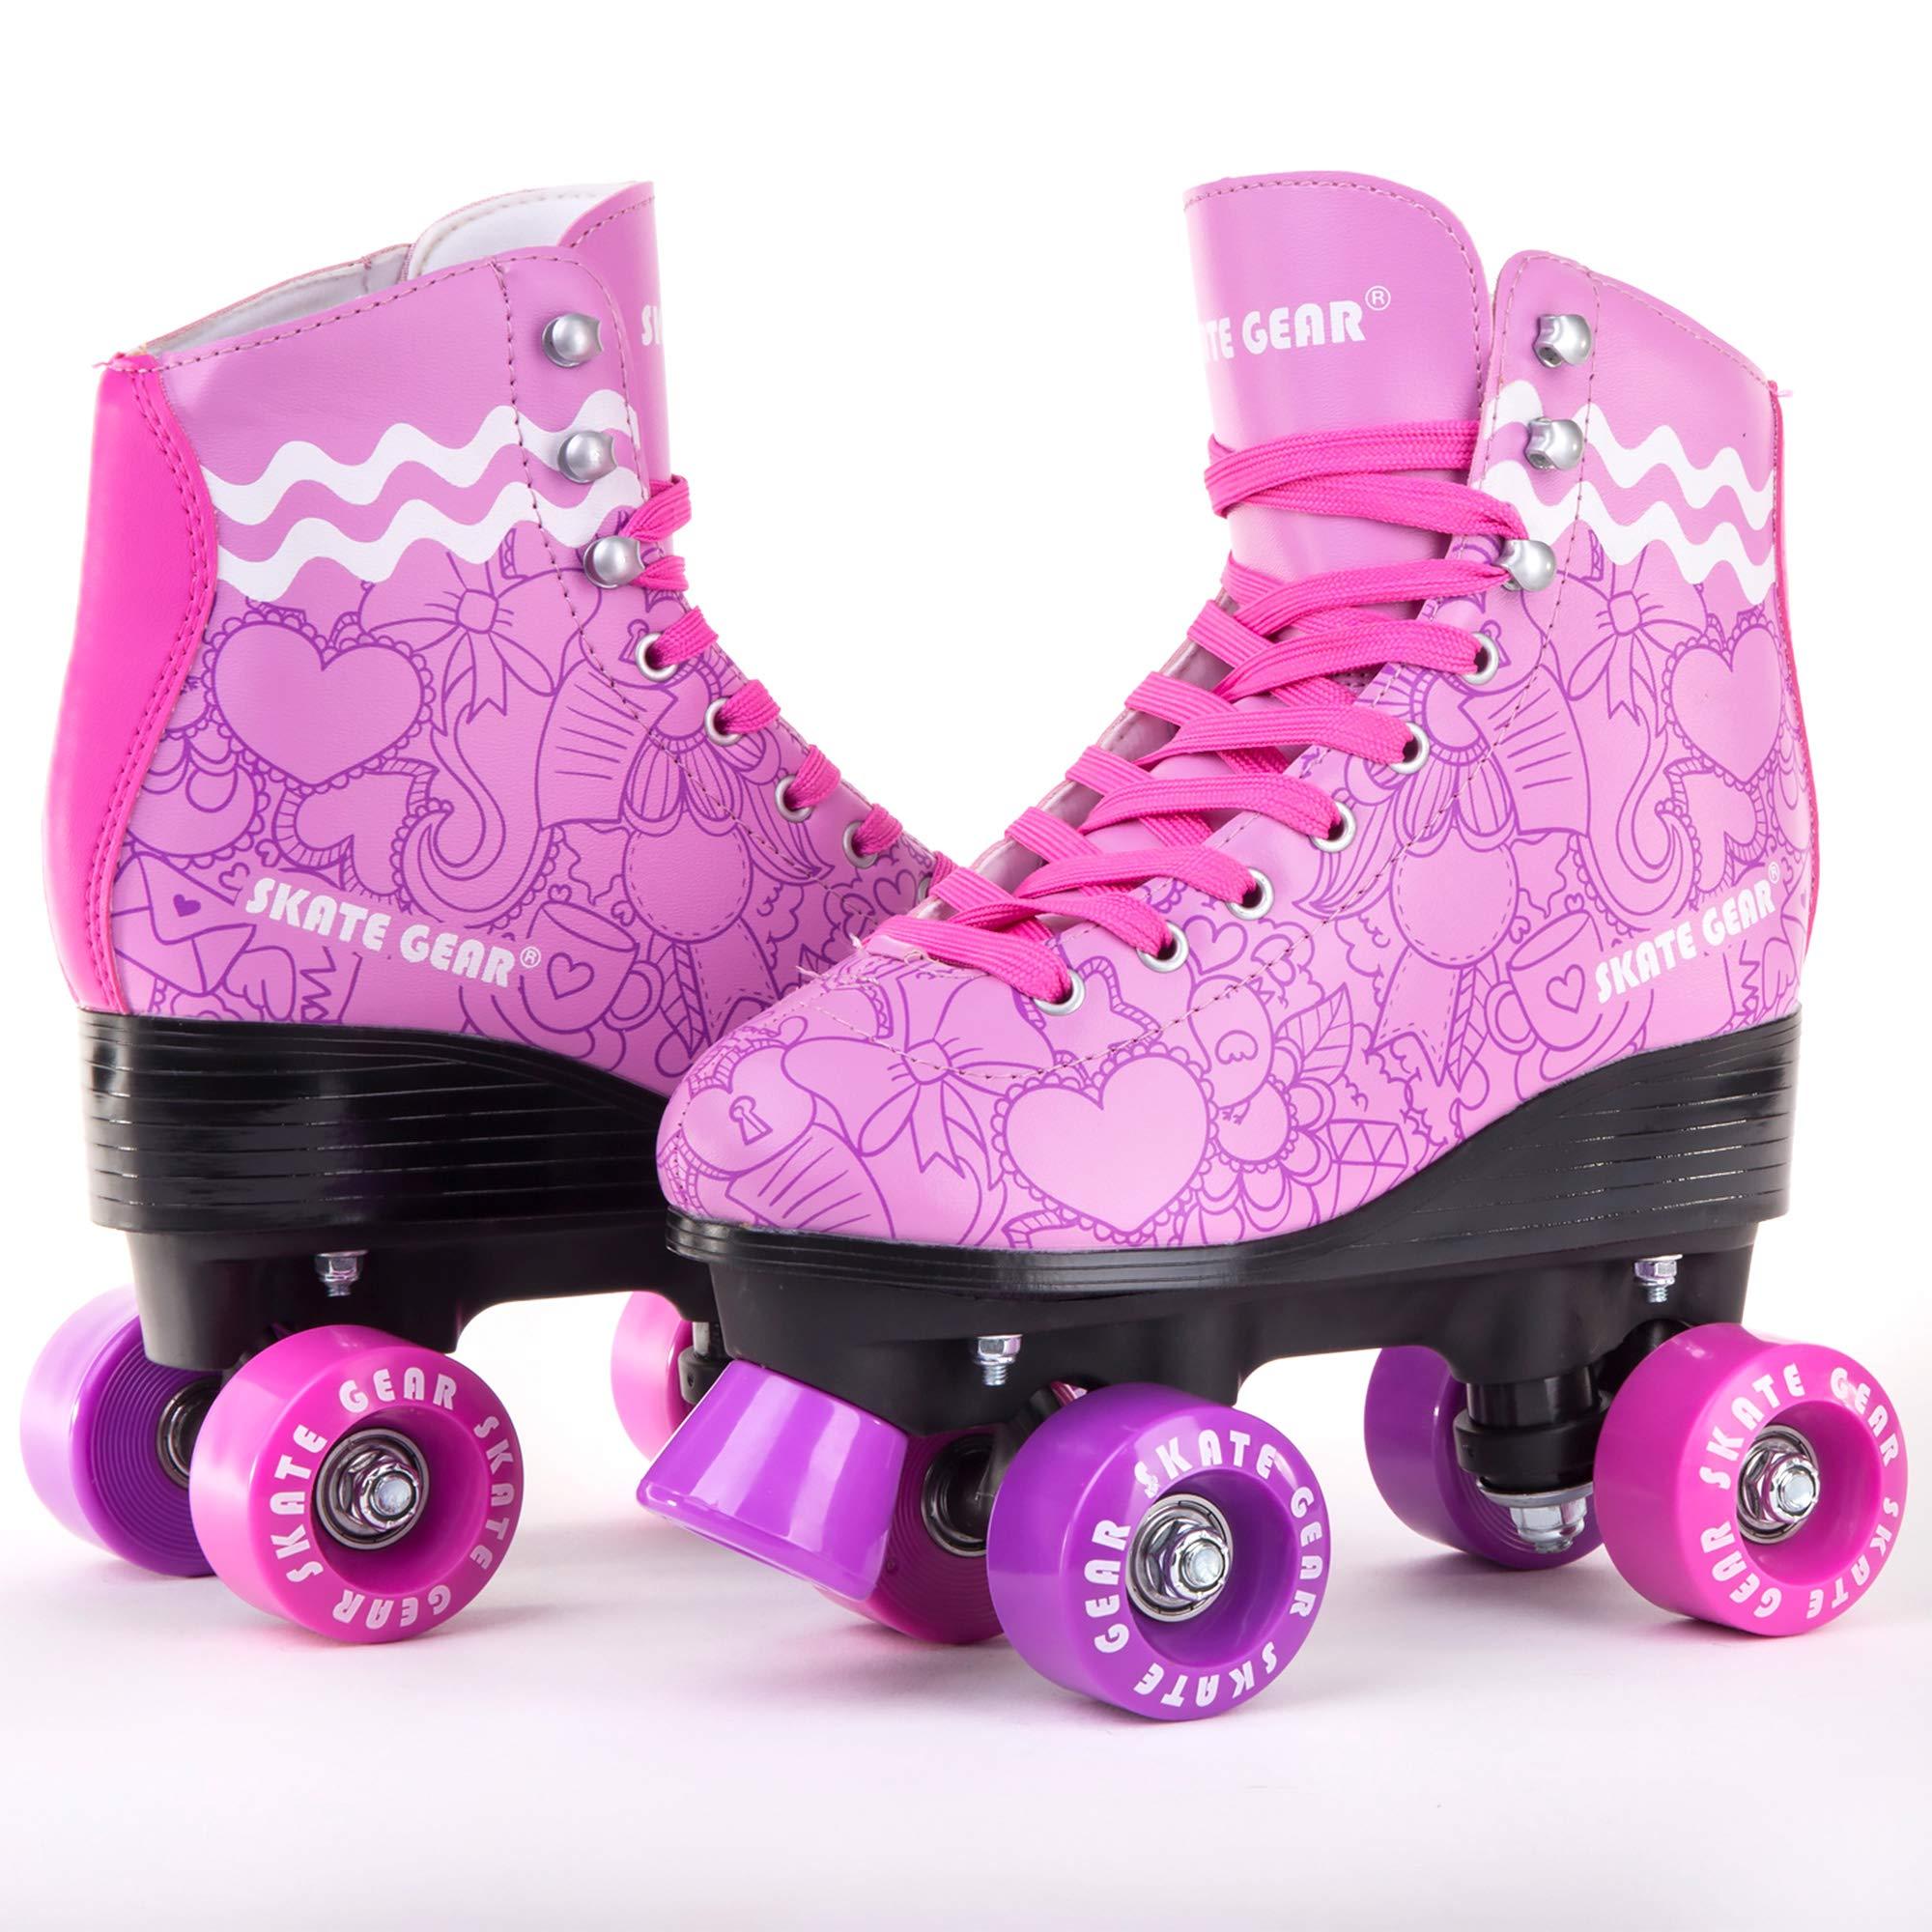 Cal 7 Roller Skates for Indoor & Outdoor